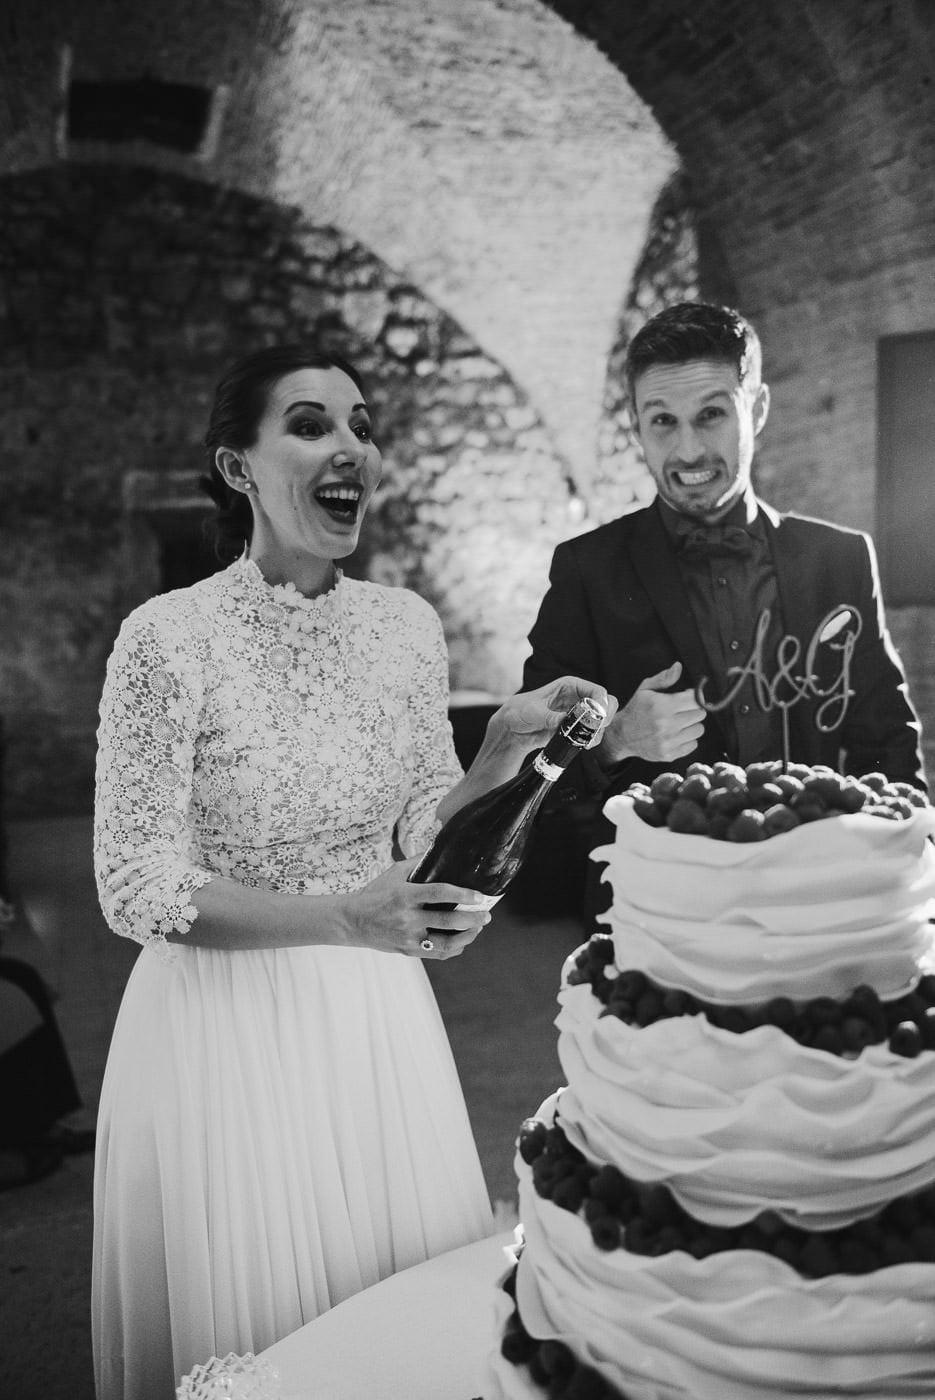 Matrimonio Giulia & Alessandro 28_12 – Alessio Nobili Photographer-67